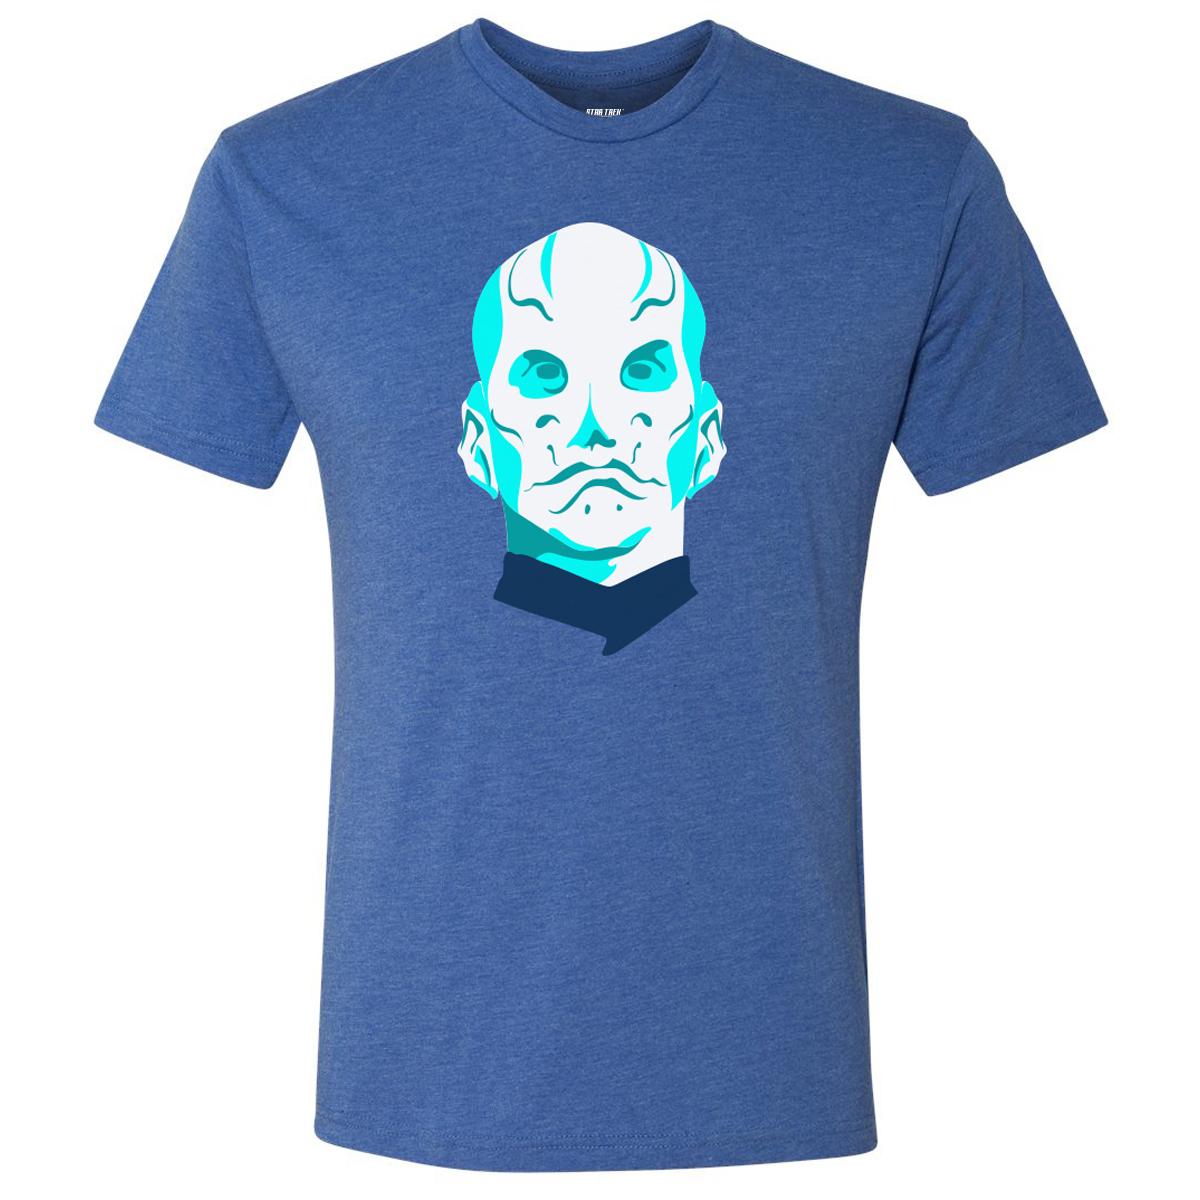 Star Trek Discovery Saru Silhouette T-Shirt